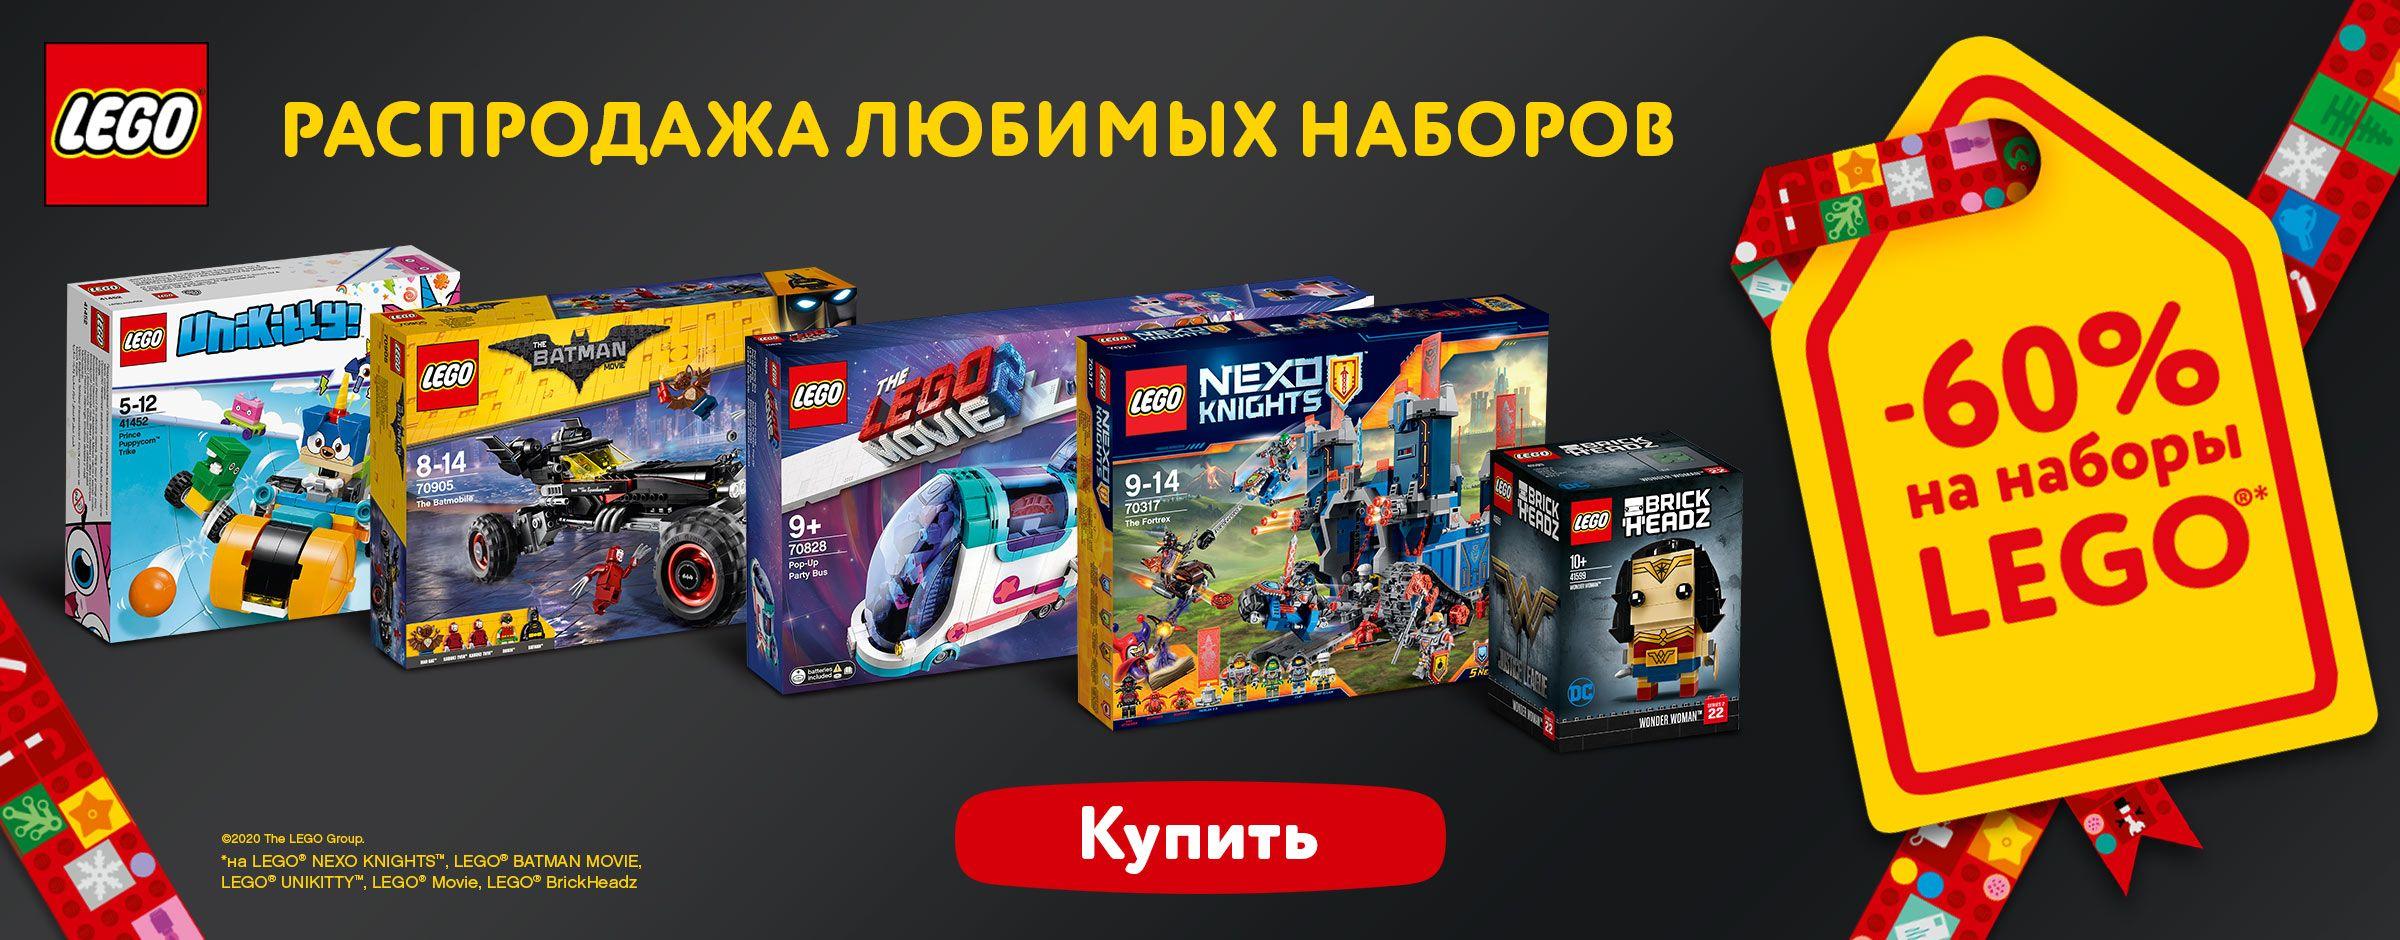 До 60% на Lego